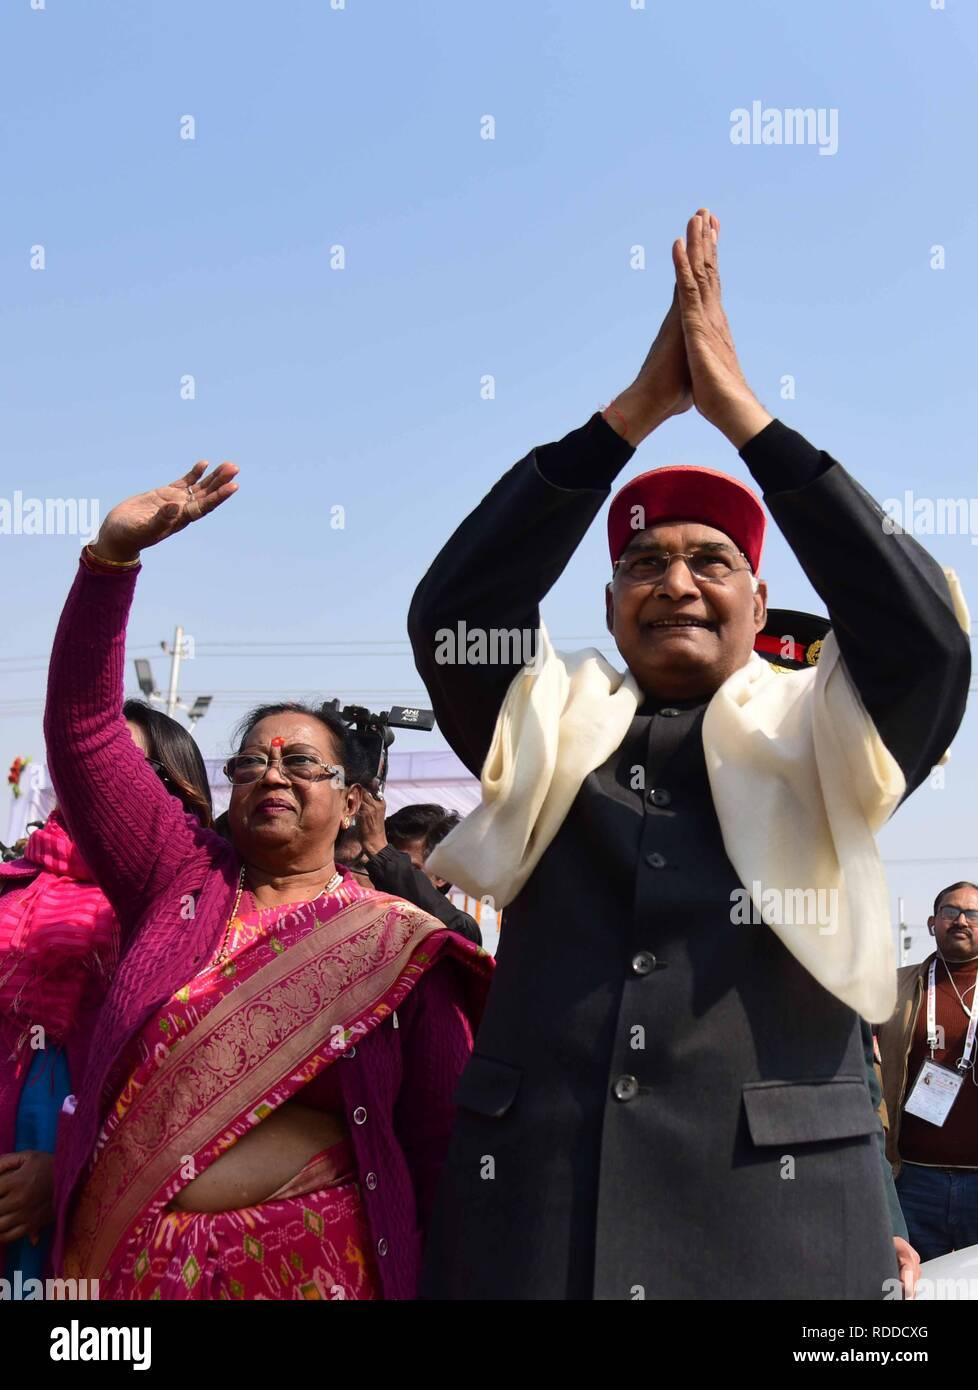 Allahabad, Uttar Pradesh, India. 17th Jan, 2019. India's President RAM NATH KOVIND and his wife wave as they arrived at Sangam for Ganga Pujan in Allahabad during Kumbh Mela. Credit: Prabhat Kumar Verma/ZUMA Wire/Alamy Live News Stock Photo